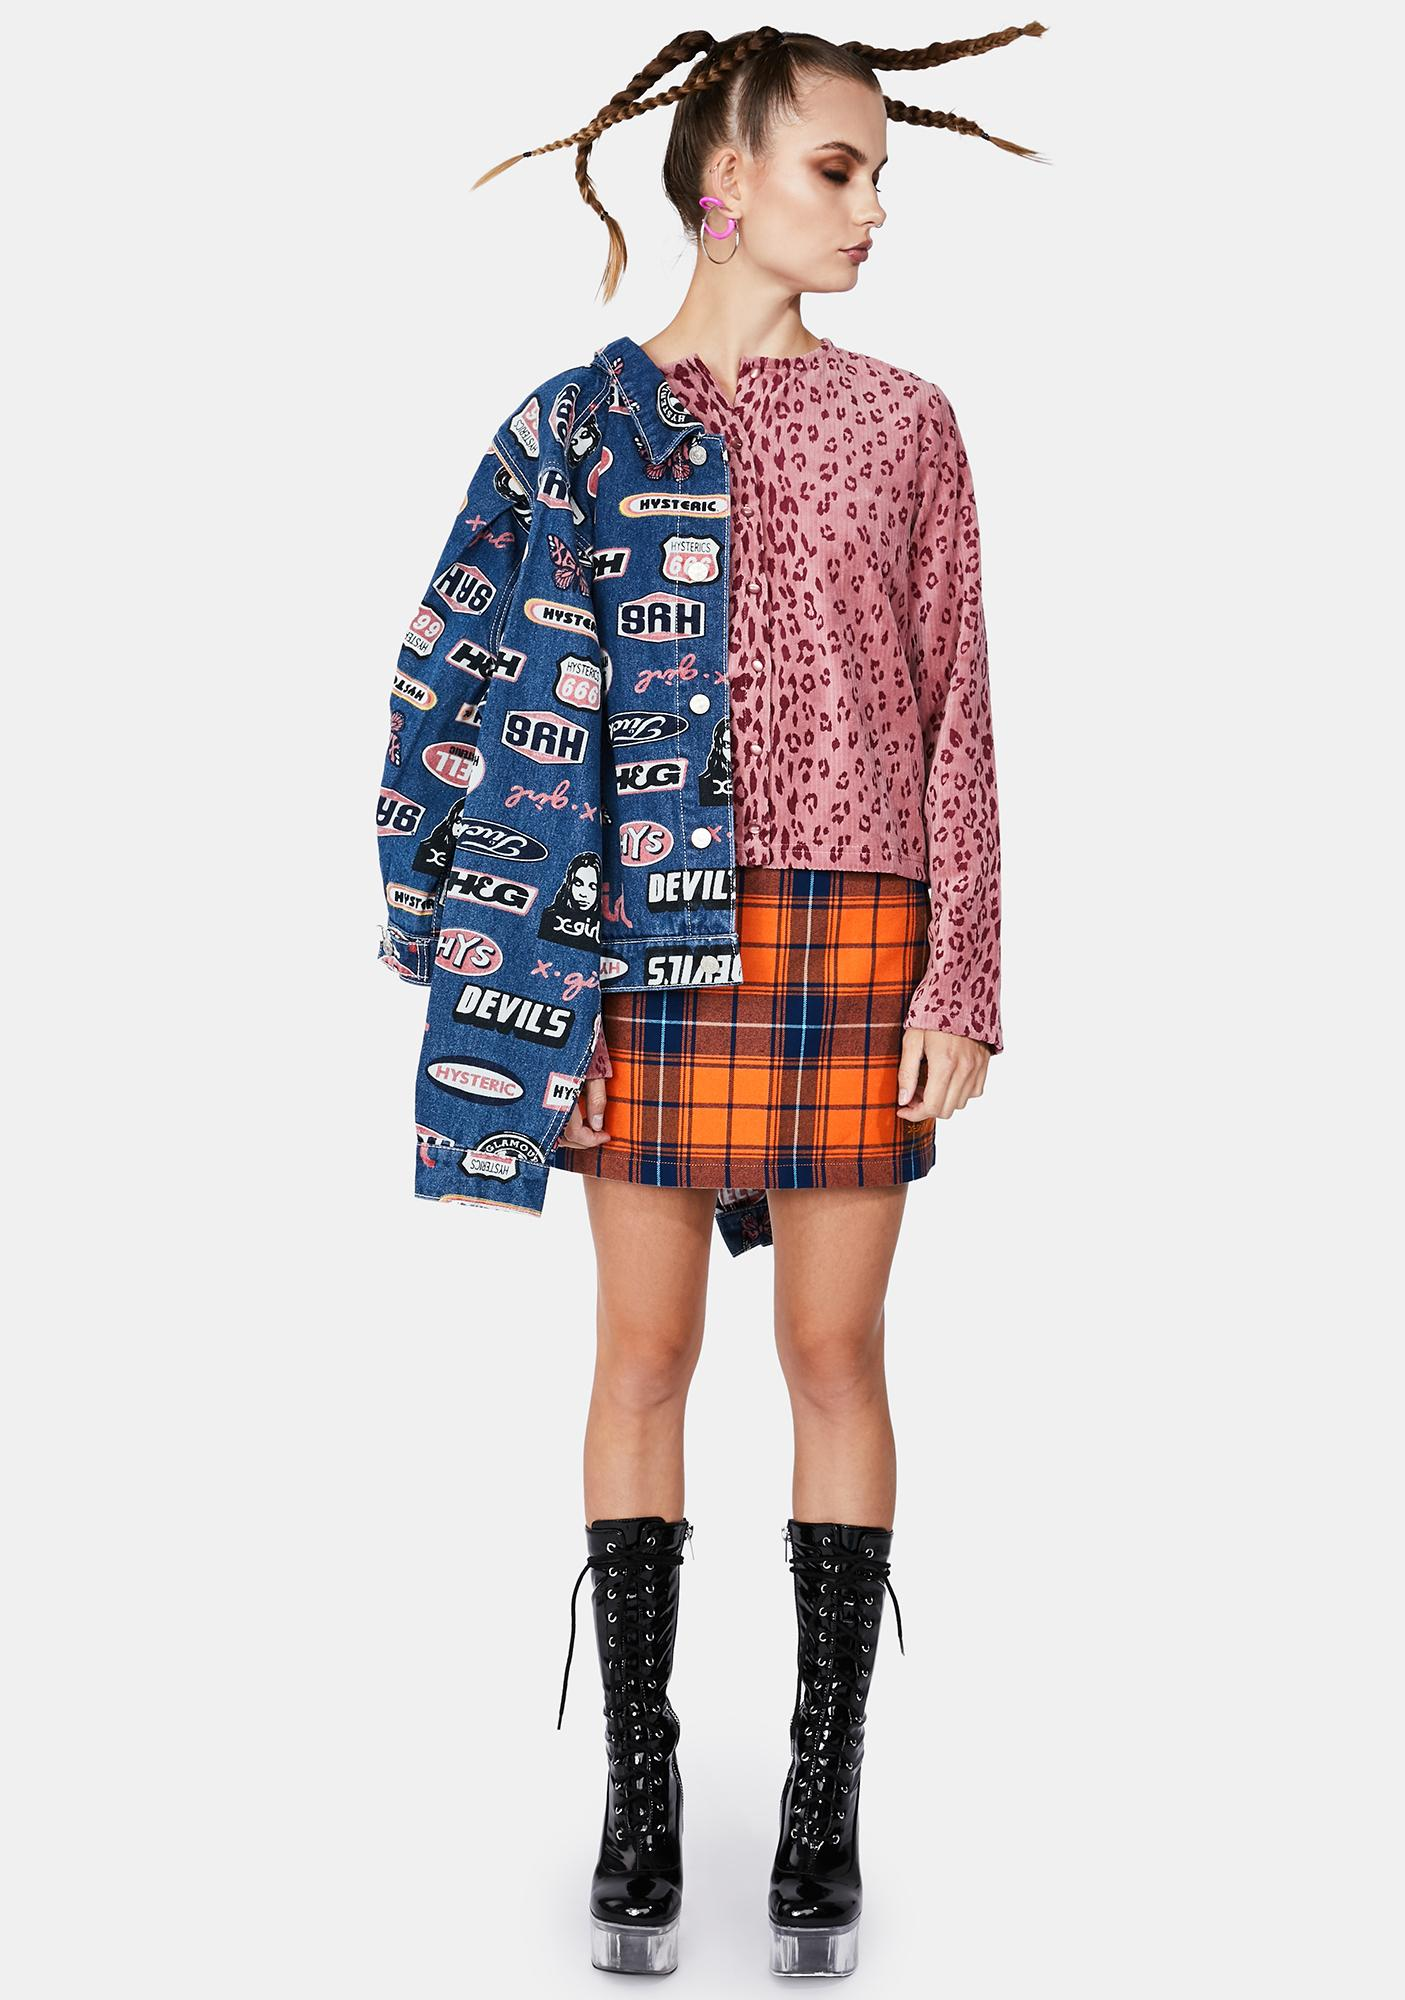 x-Girl Orange Plaid Mini Skirt